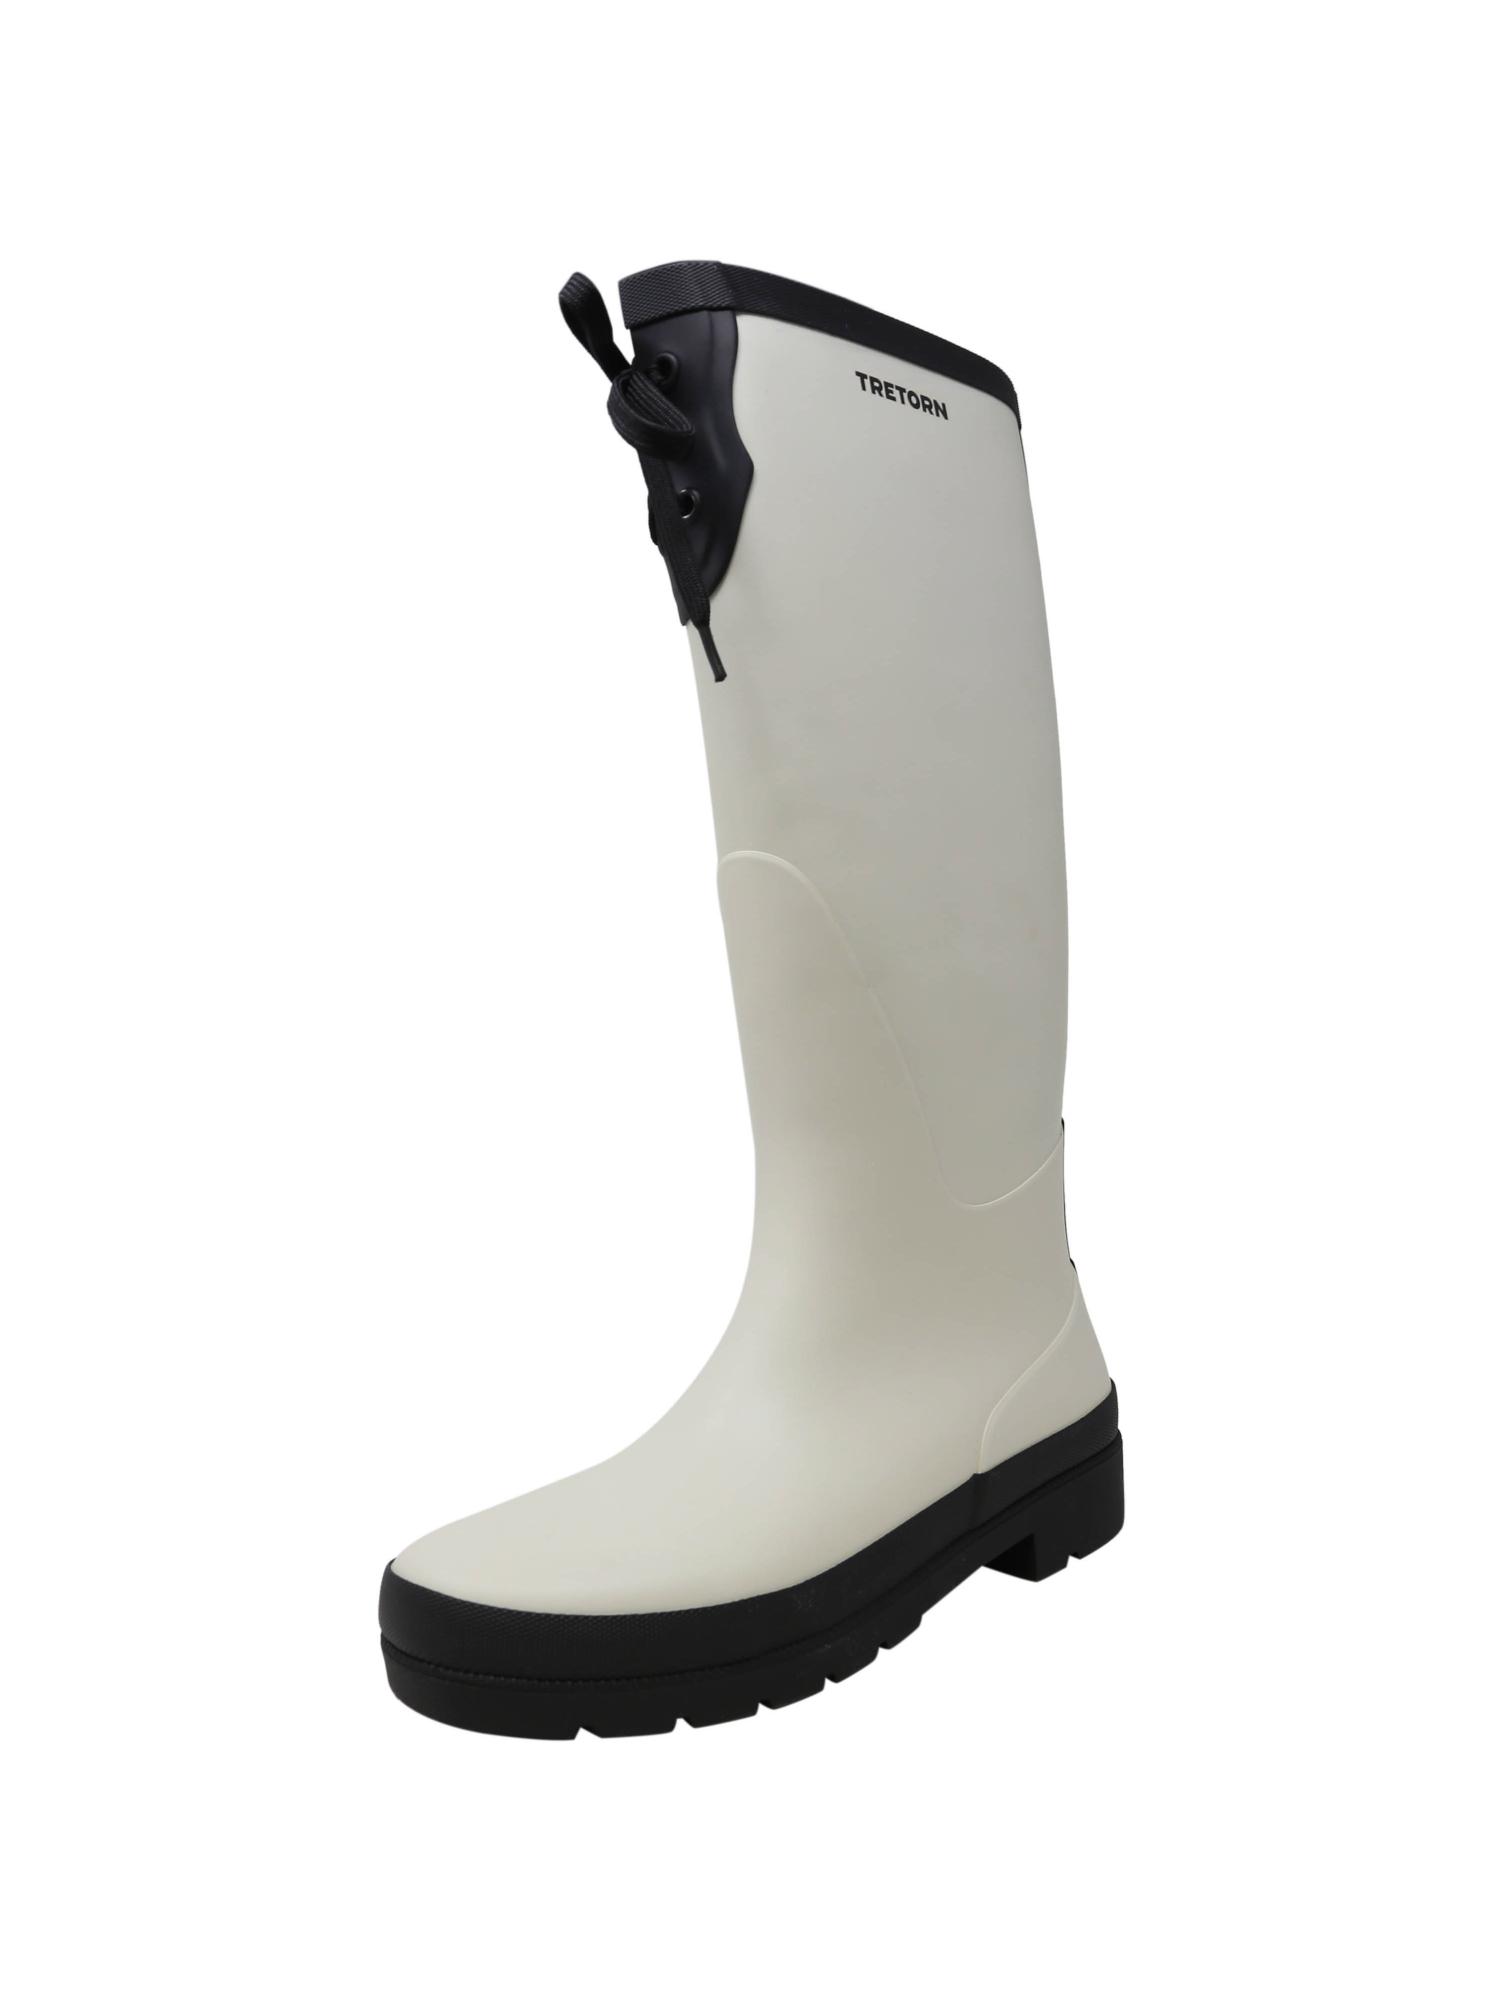 Tretorn-Women-039-s-Lacey-Rubber-Knee-High-Rain-Boot thumbnail 16